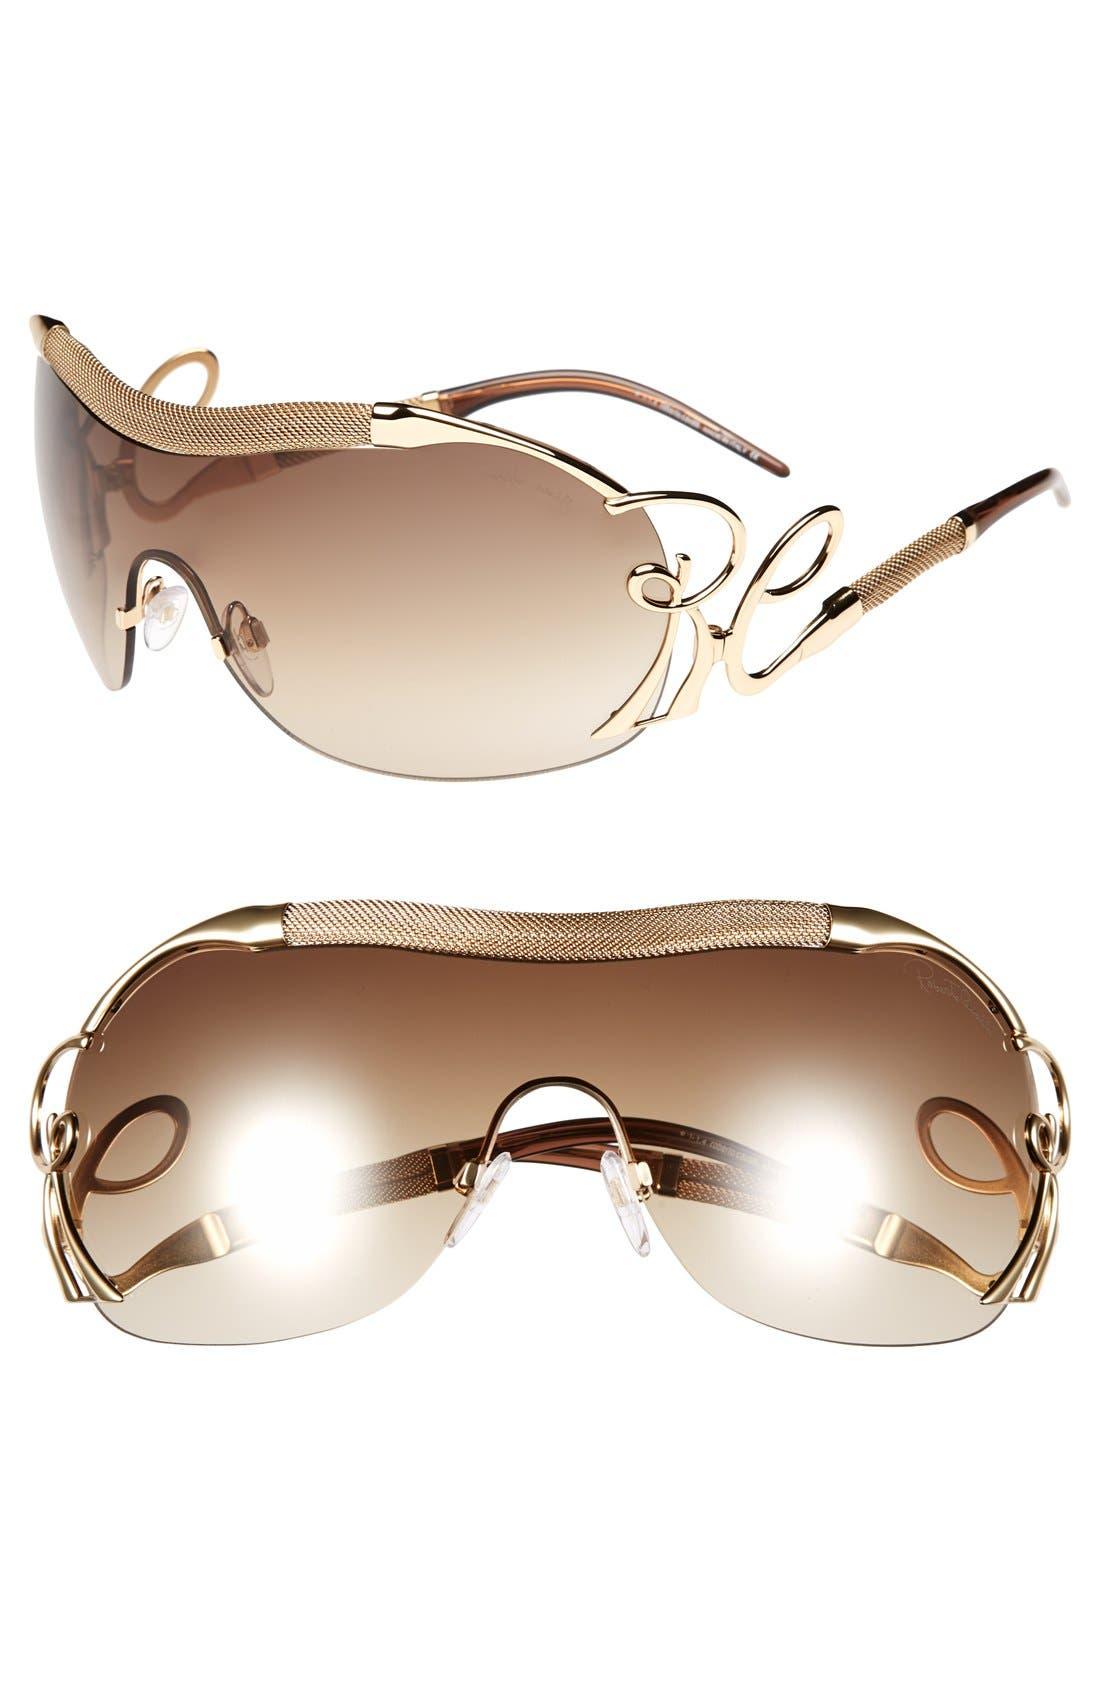 Alternate Image 1 Selected - Roberto Cavalli 'Botein' Shield Sunglasses